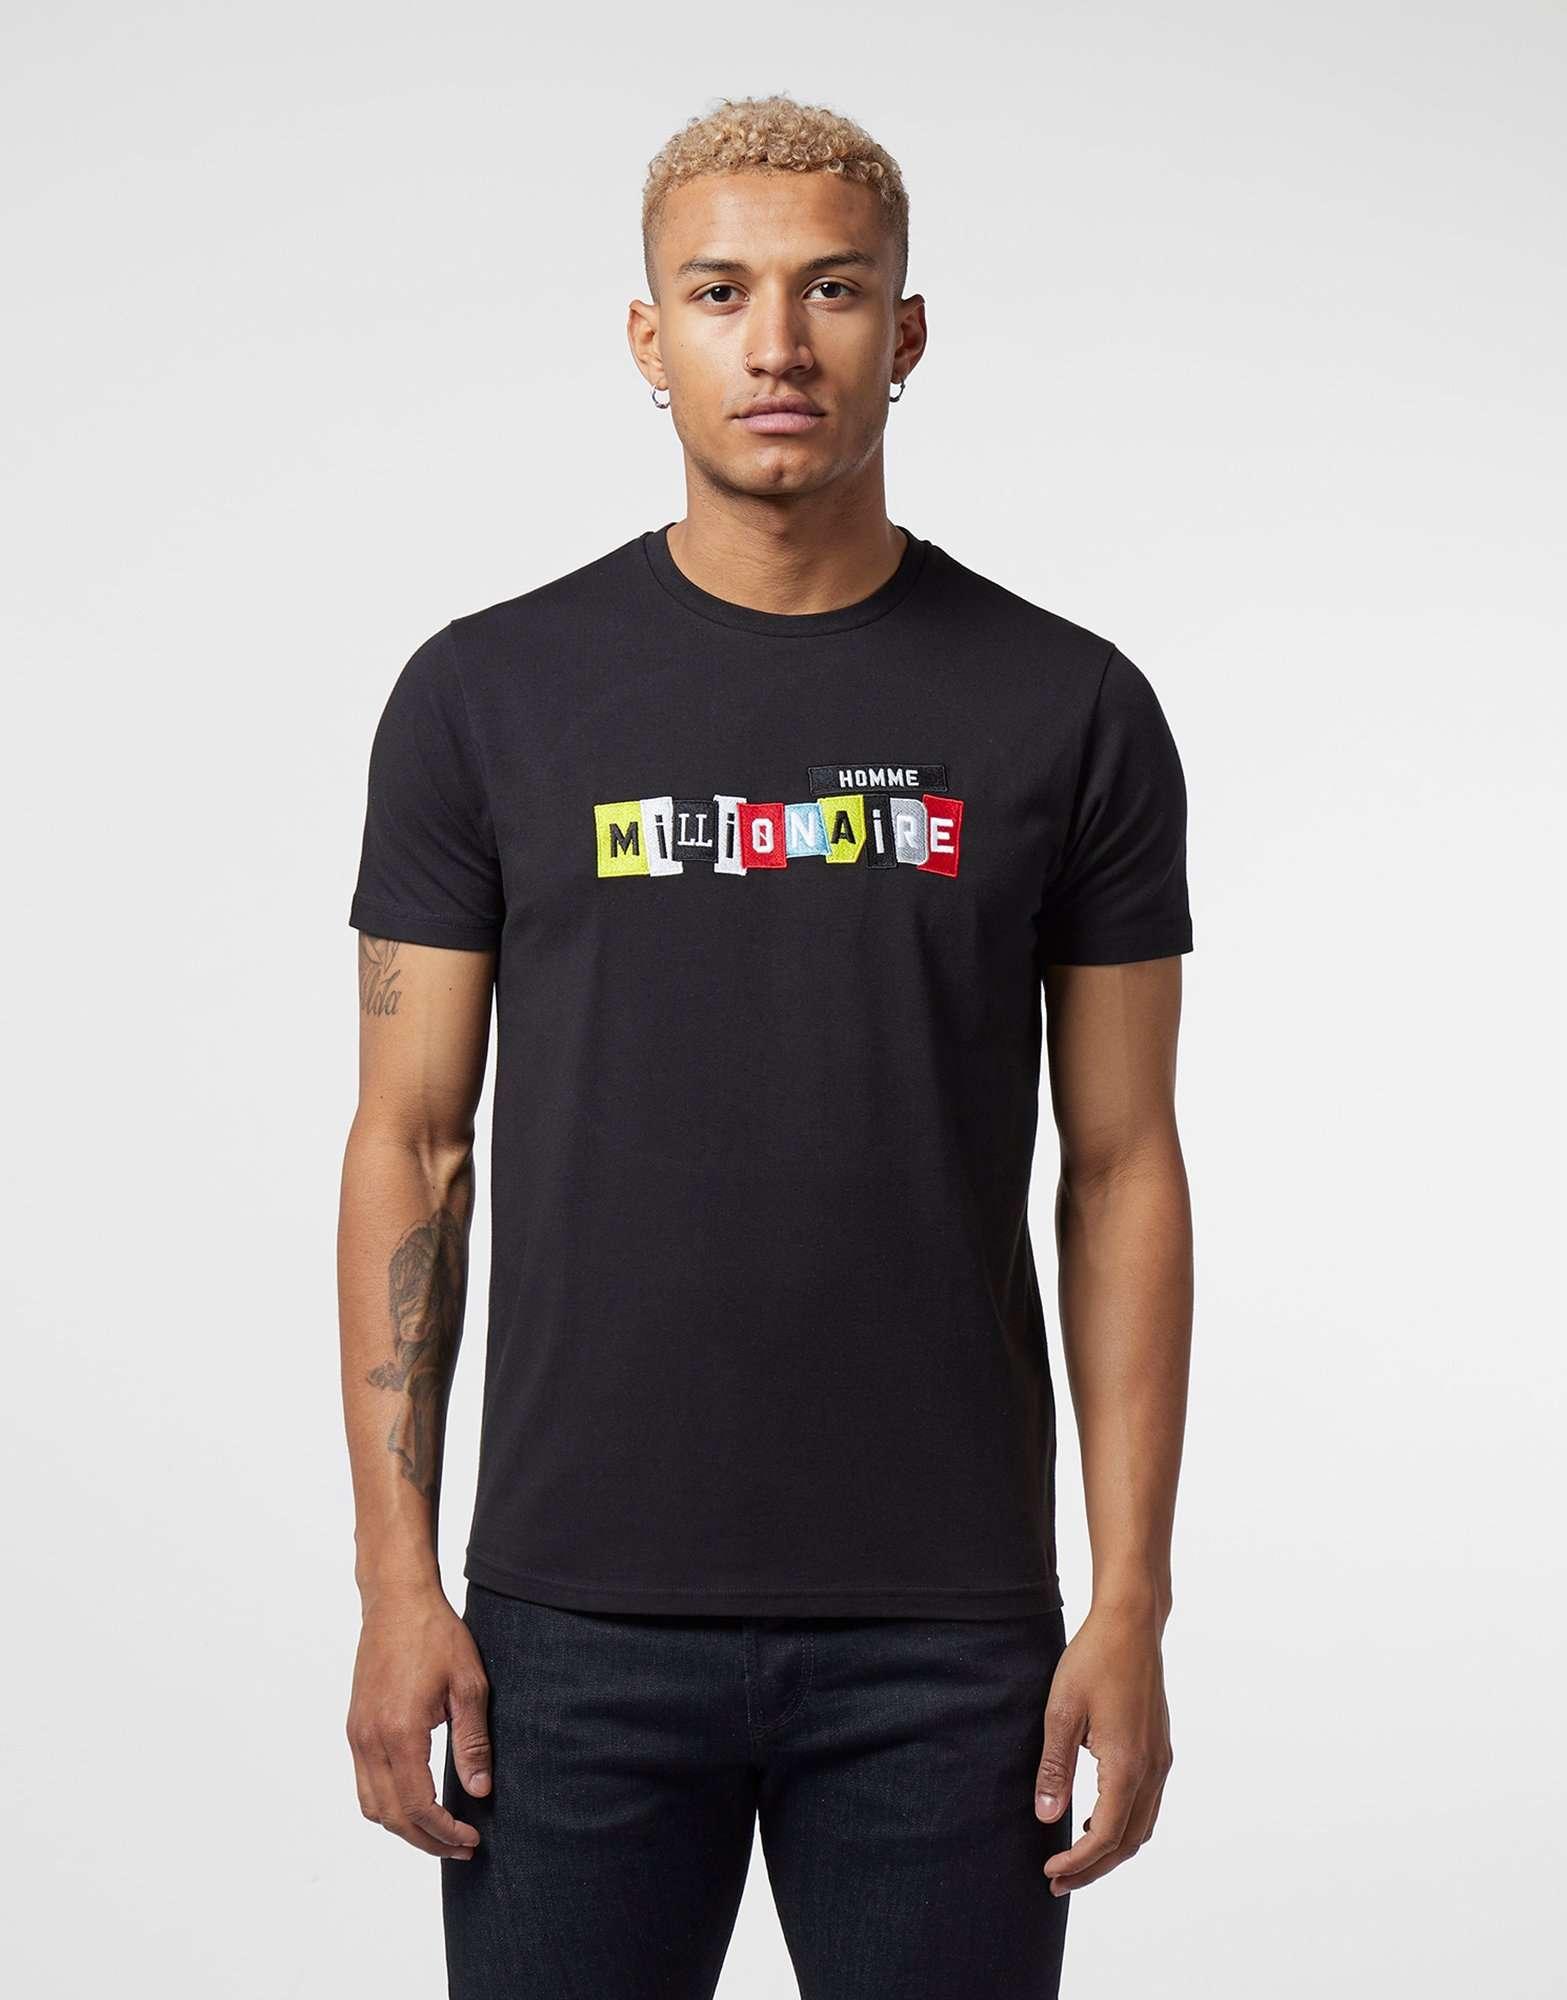 Millionaire Homme Patch Logo Short Sleeve T-Shirt